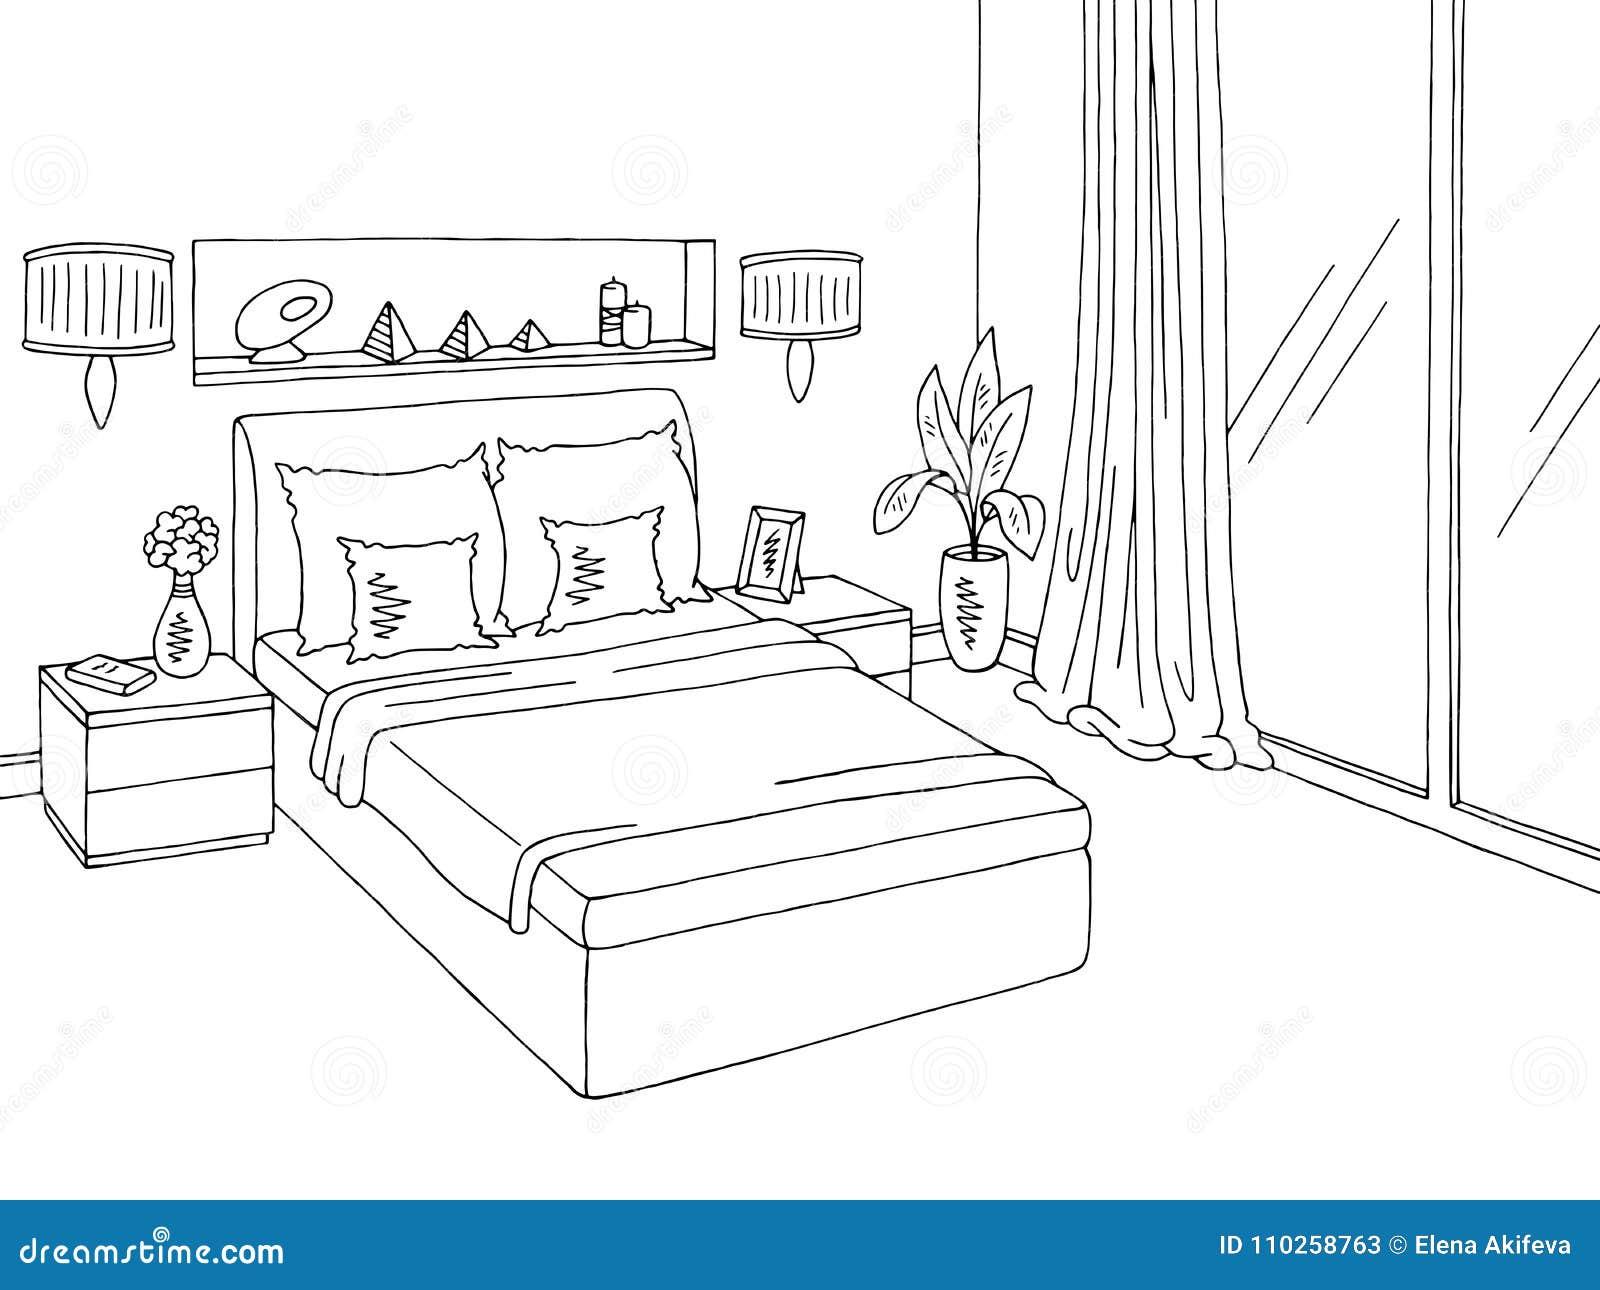 Bedroom Graphic Black White Home Interior Sketch Illustration Stock